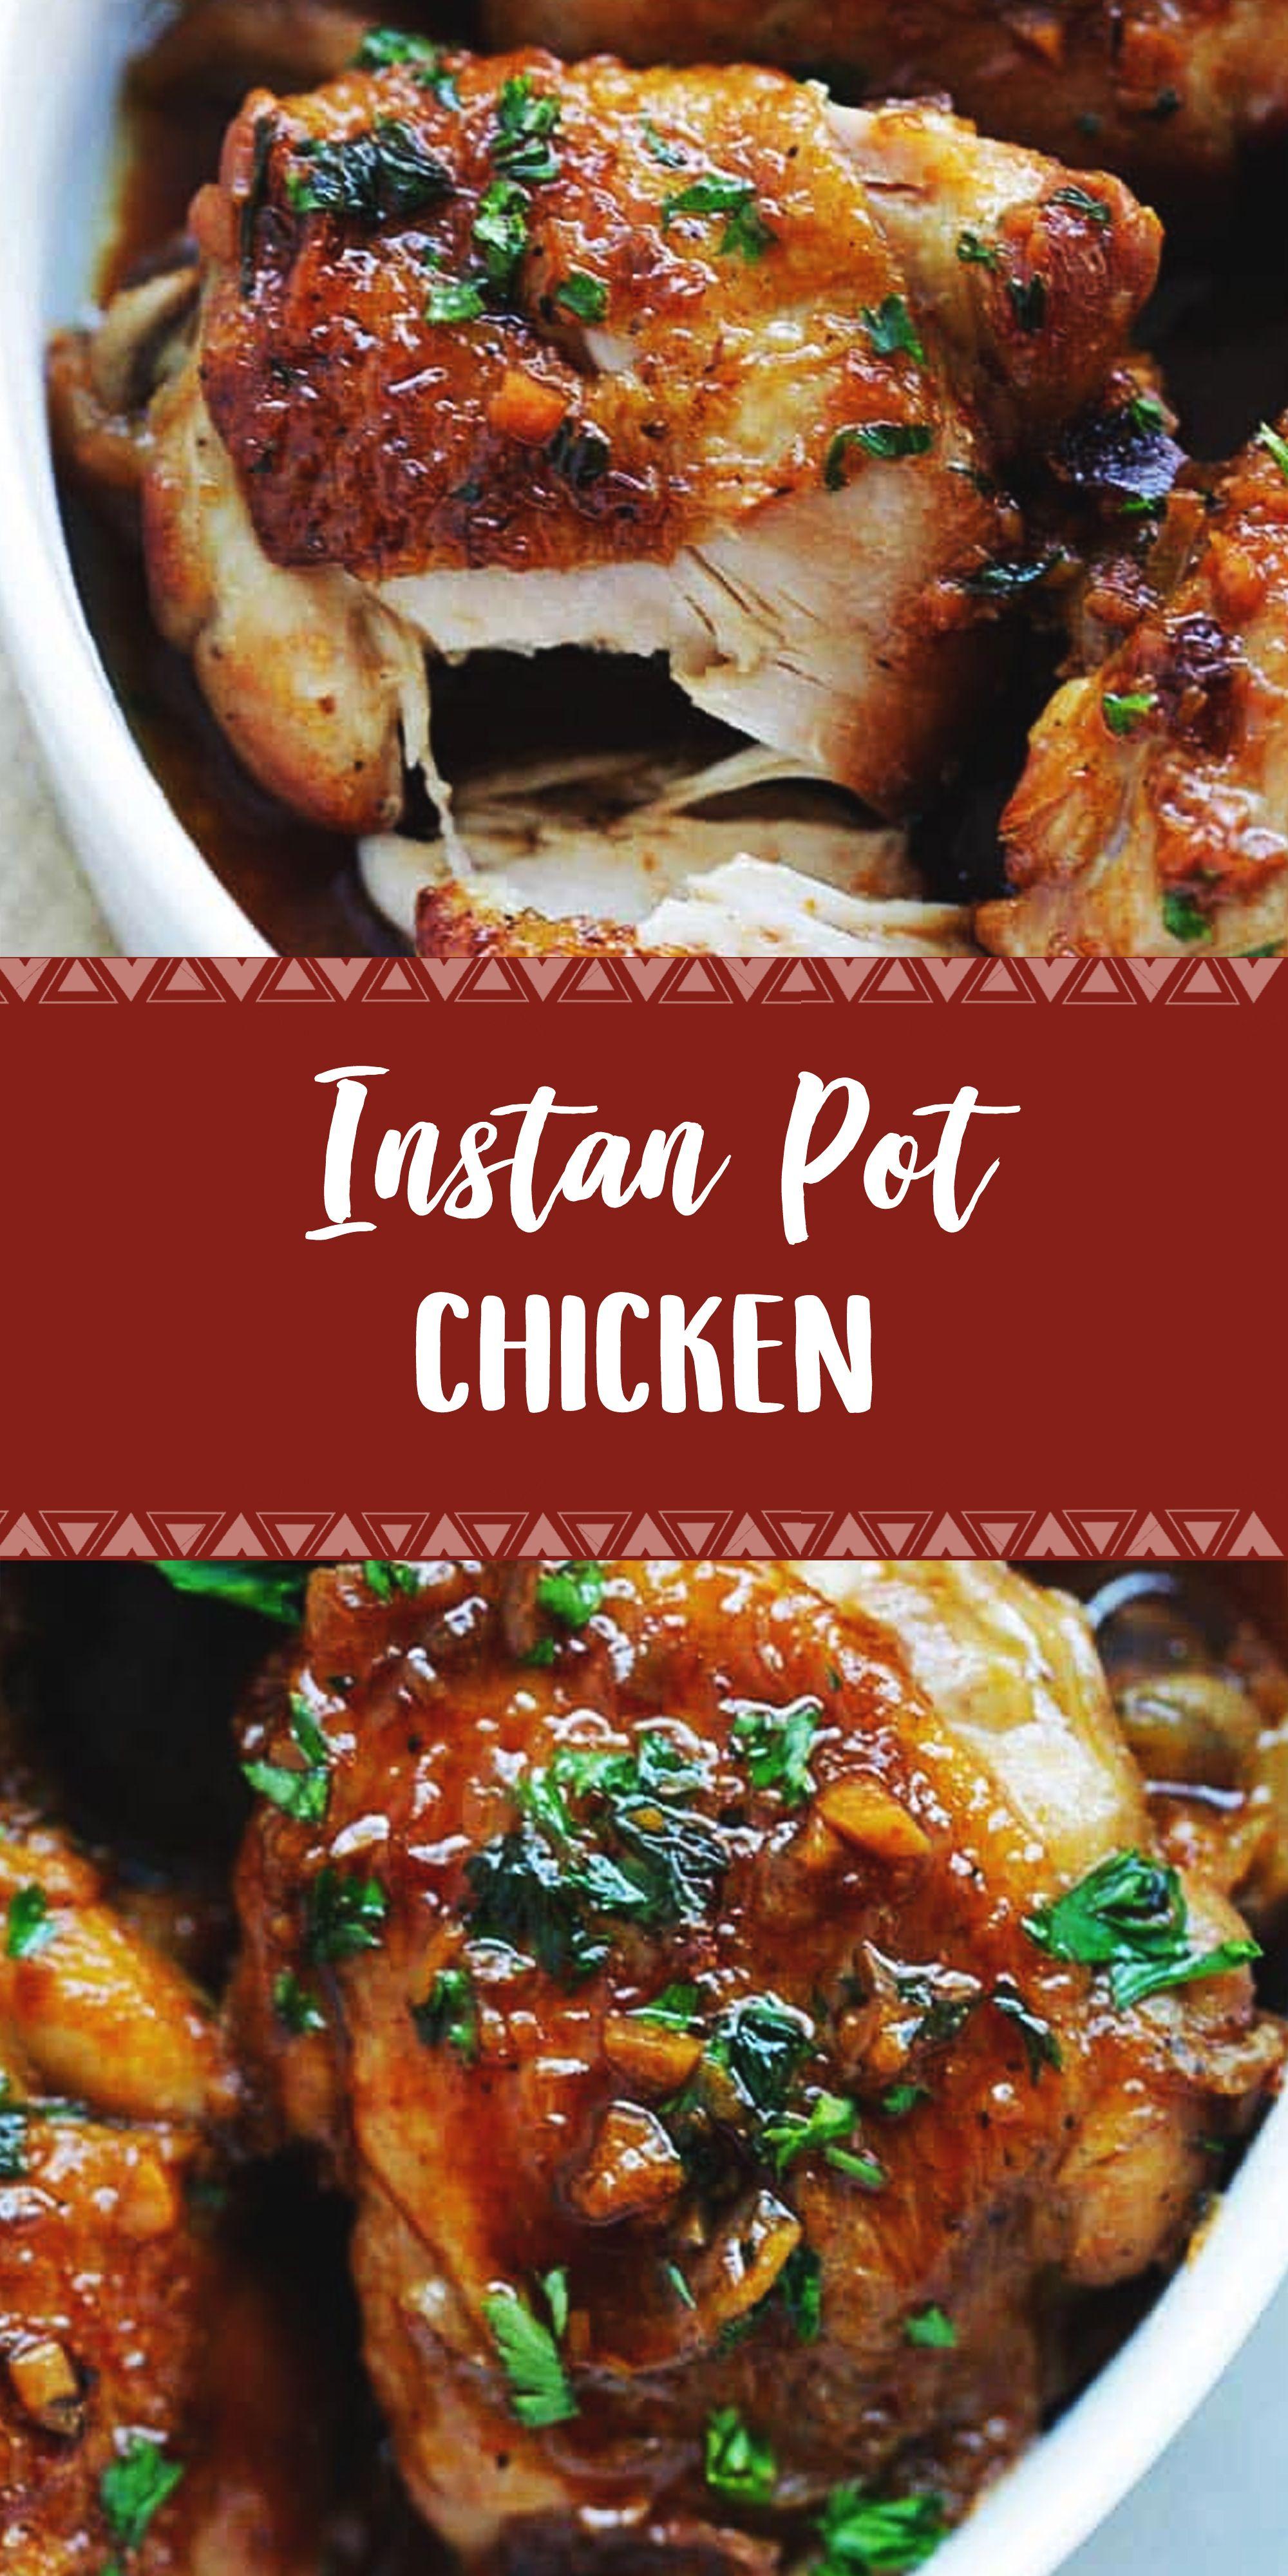 Instant Pot Chicken Instant Pot Recipes Chicken Instant Pot Recipes Chicken Recipes Easy Quick